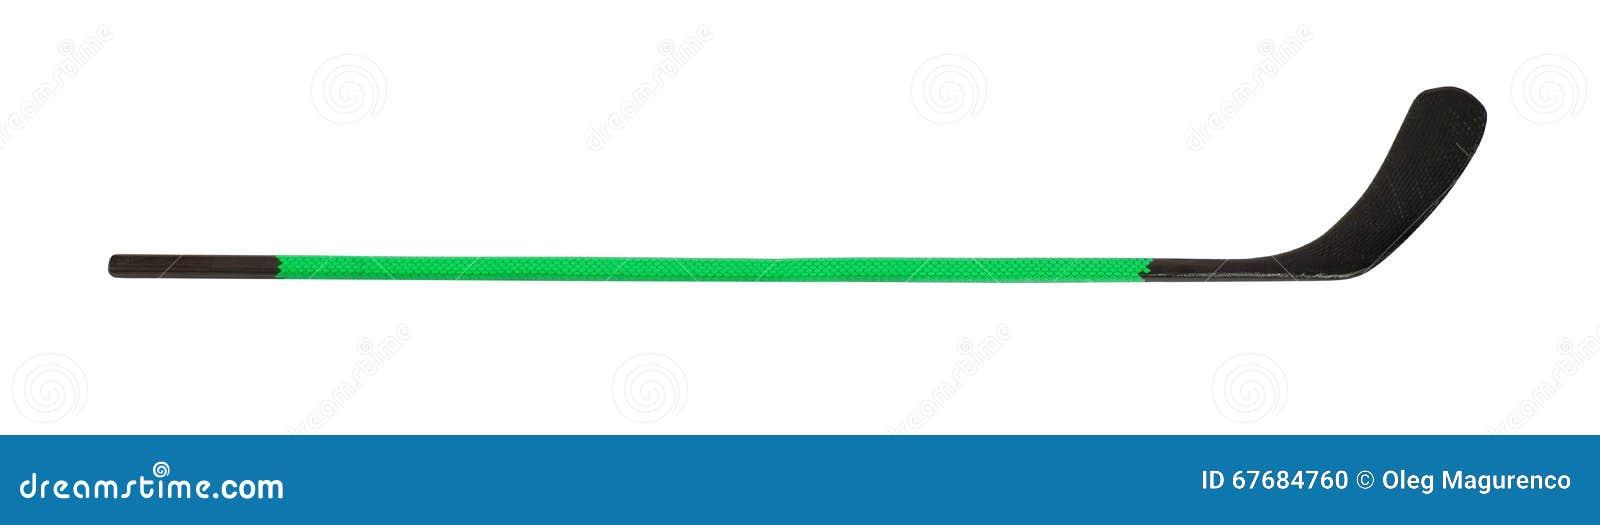 Bâton de hockey de glace